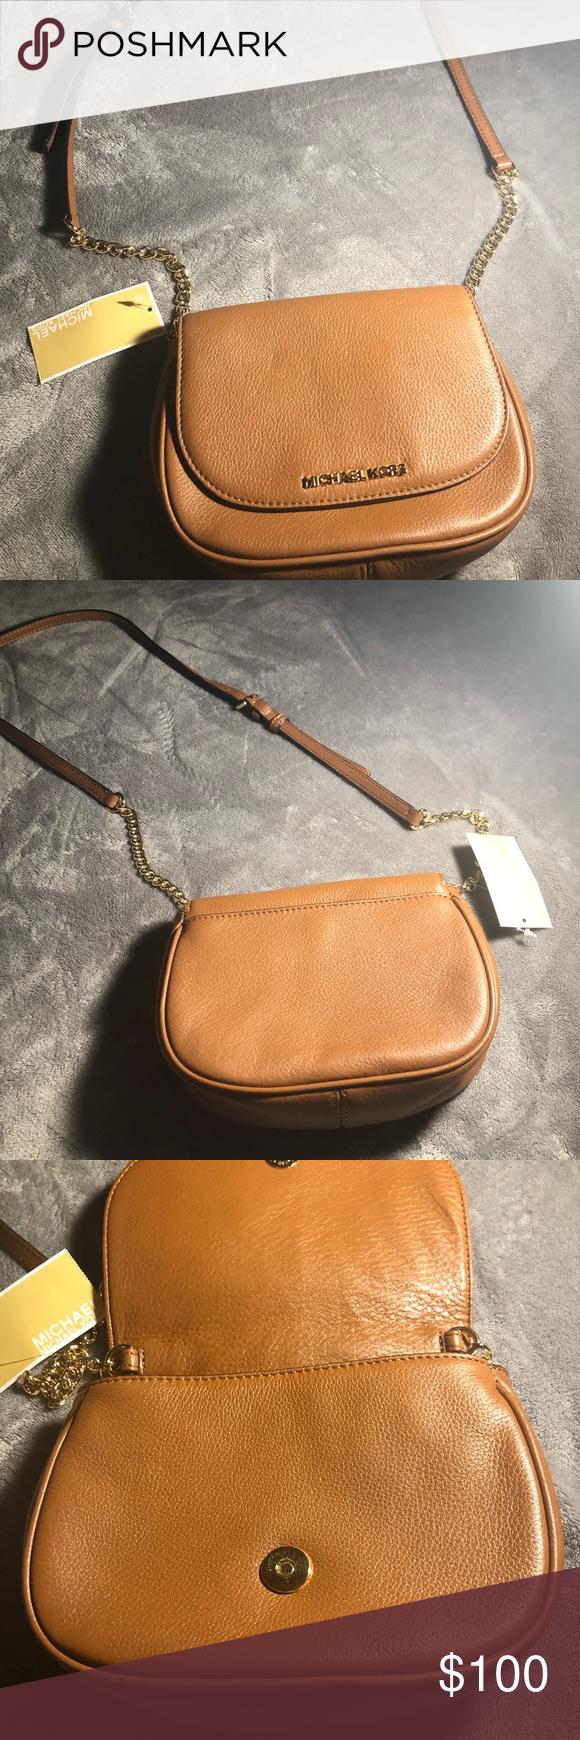 9f89bd24835e NWT Michael Kors Crossbody Purse walnut leather Brand new authentic Michael  Kors Crossbody Walnut color leather